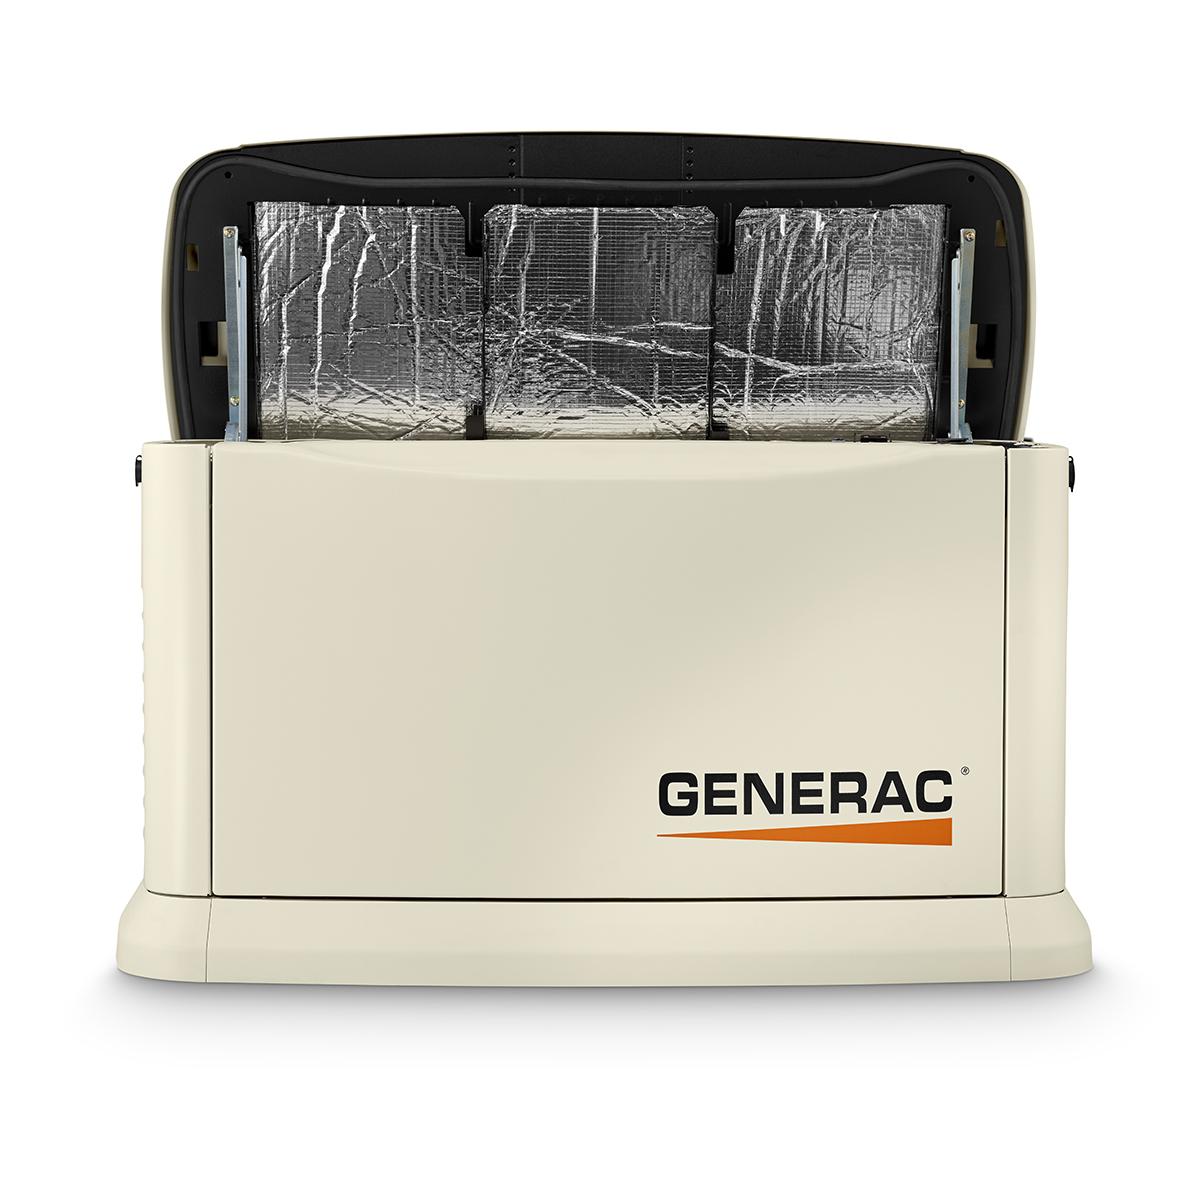 Generac 7043 22kW Home Standby Generator | Gentek Power LLC